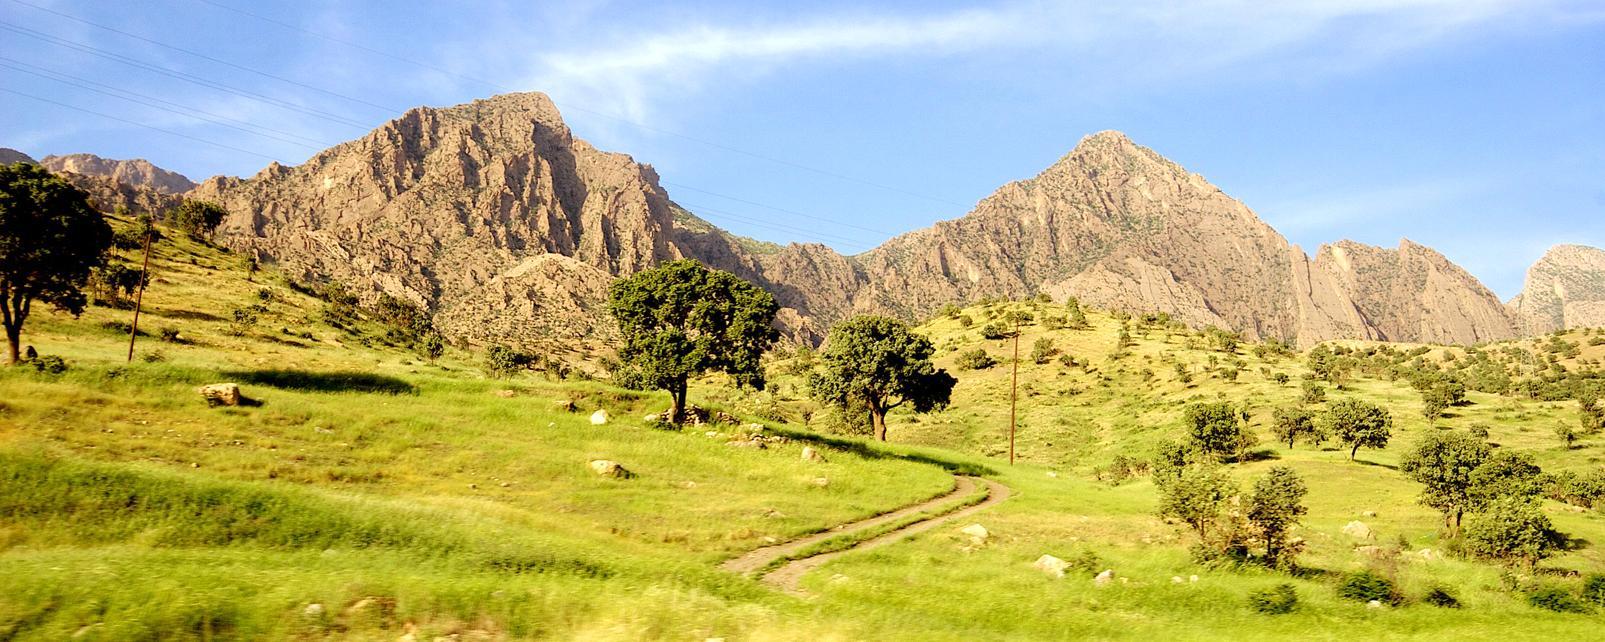 Moyen-Orient, Irak, Kurdistan, montagne, arbre, route, prairie,